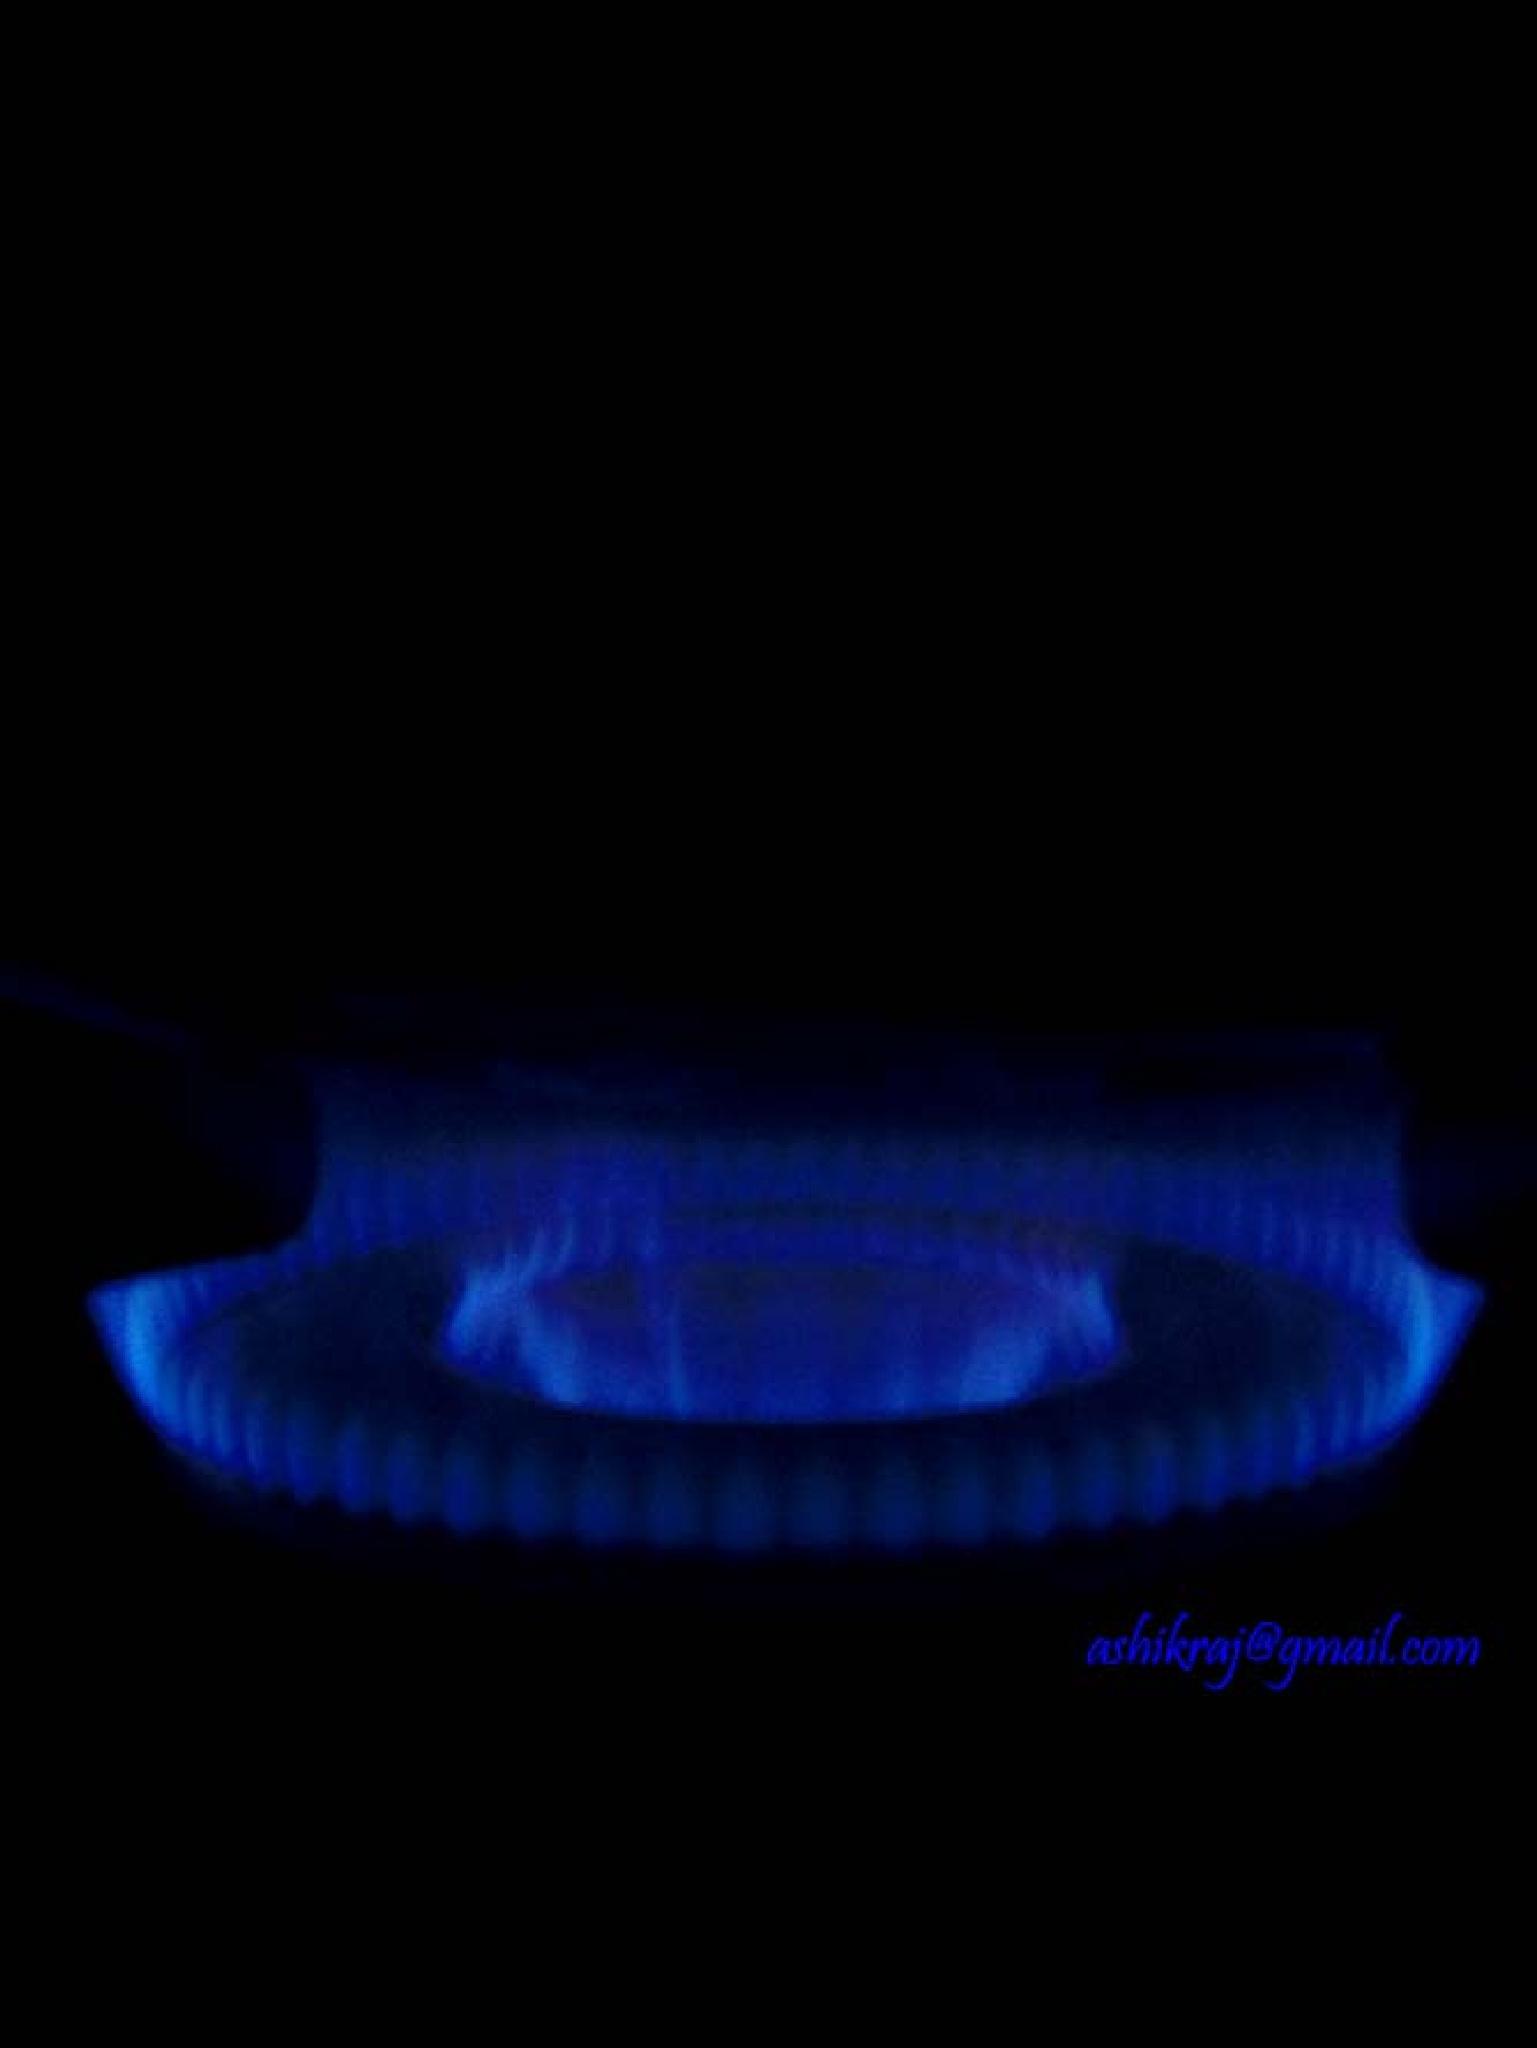 Gas Stove  by Ashik Iqbal